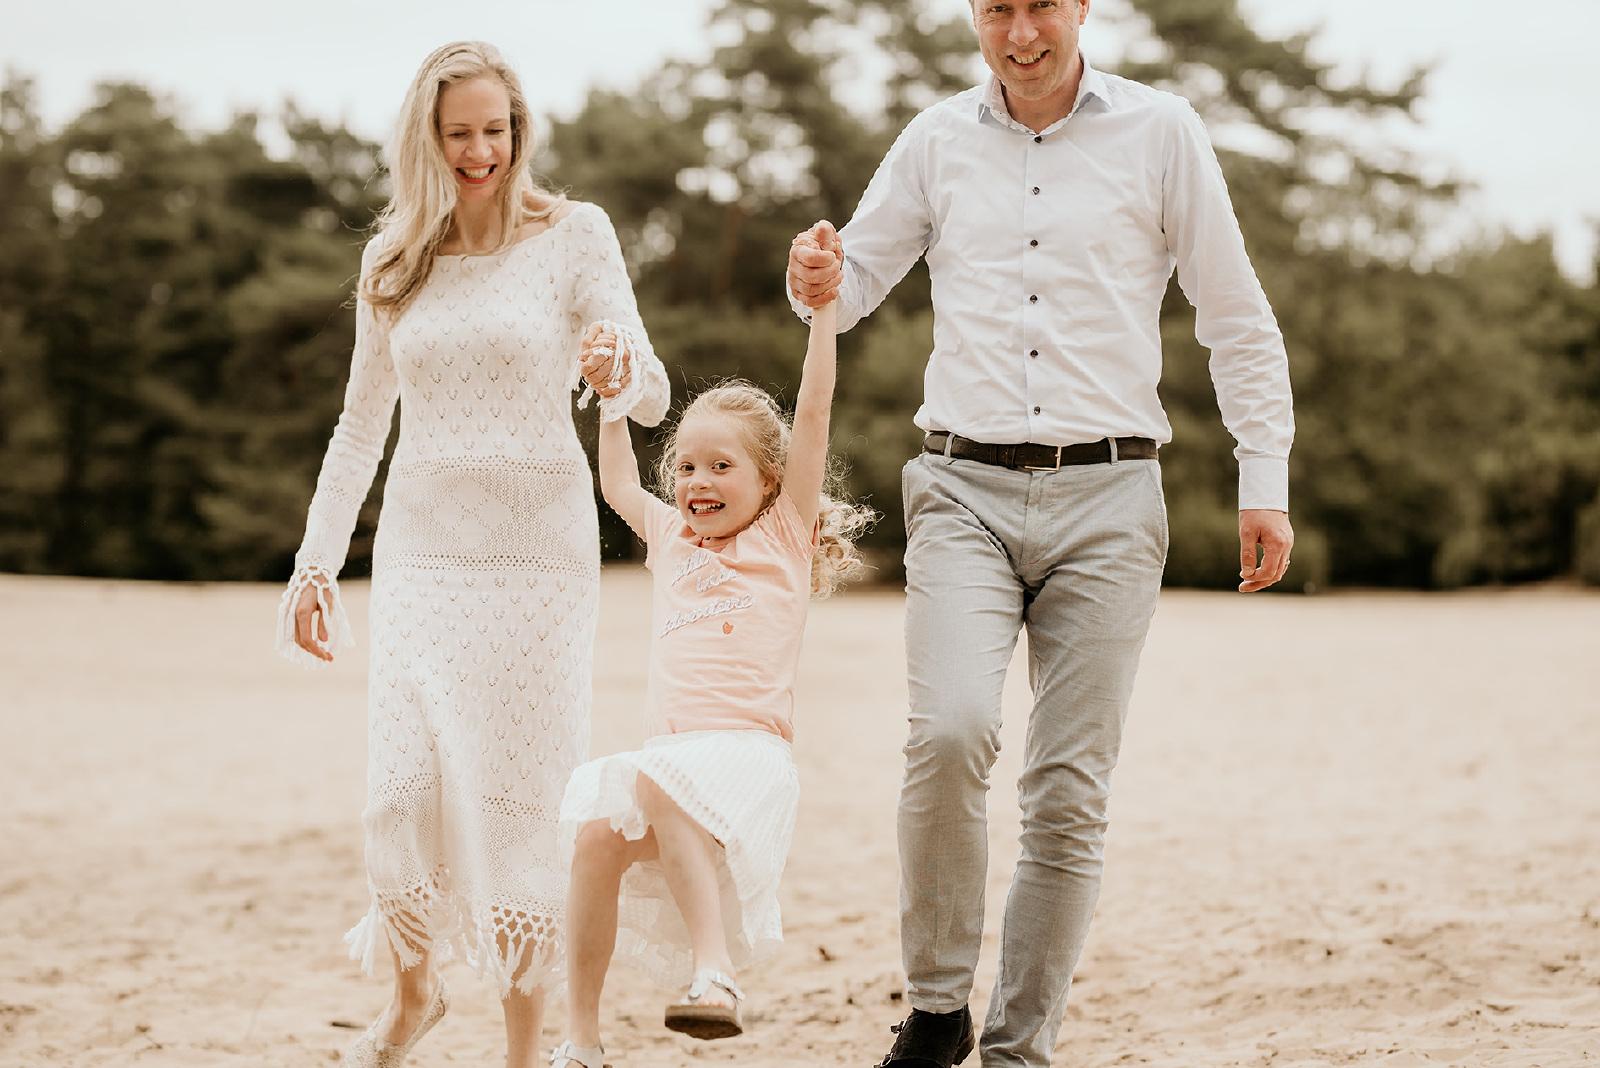 fotograaf enschede familiefoto buiten lachen zand